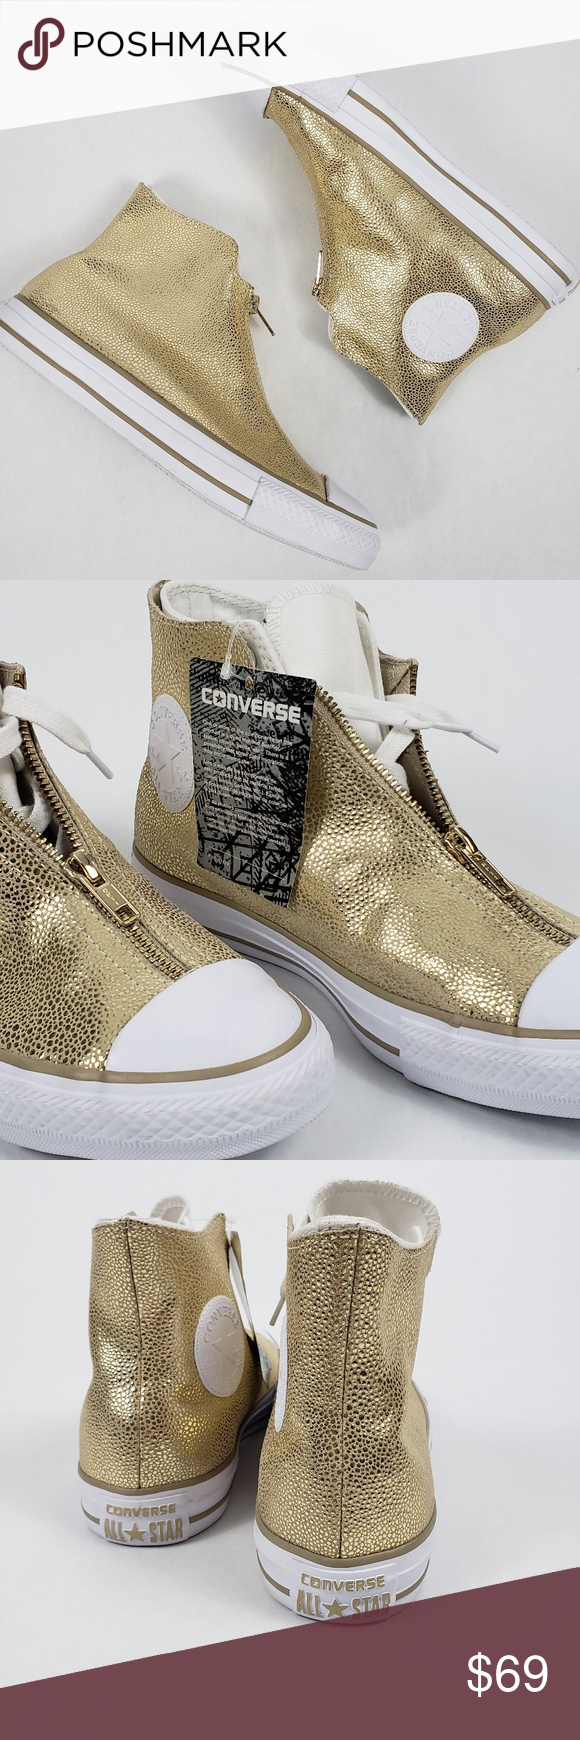 af7a20d67752 Converse All Star Classic Shroud Hi-top NEW!!!! Brand New!!! Converse All  Star High Tops Size 8 Shell- gold metallic leather with zip closure Hidden  ...